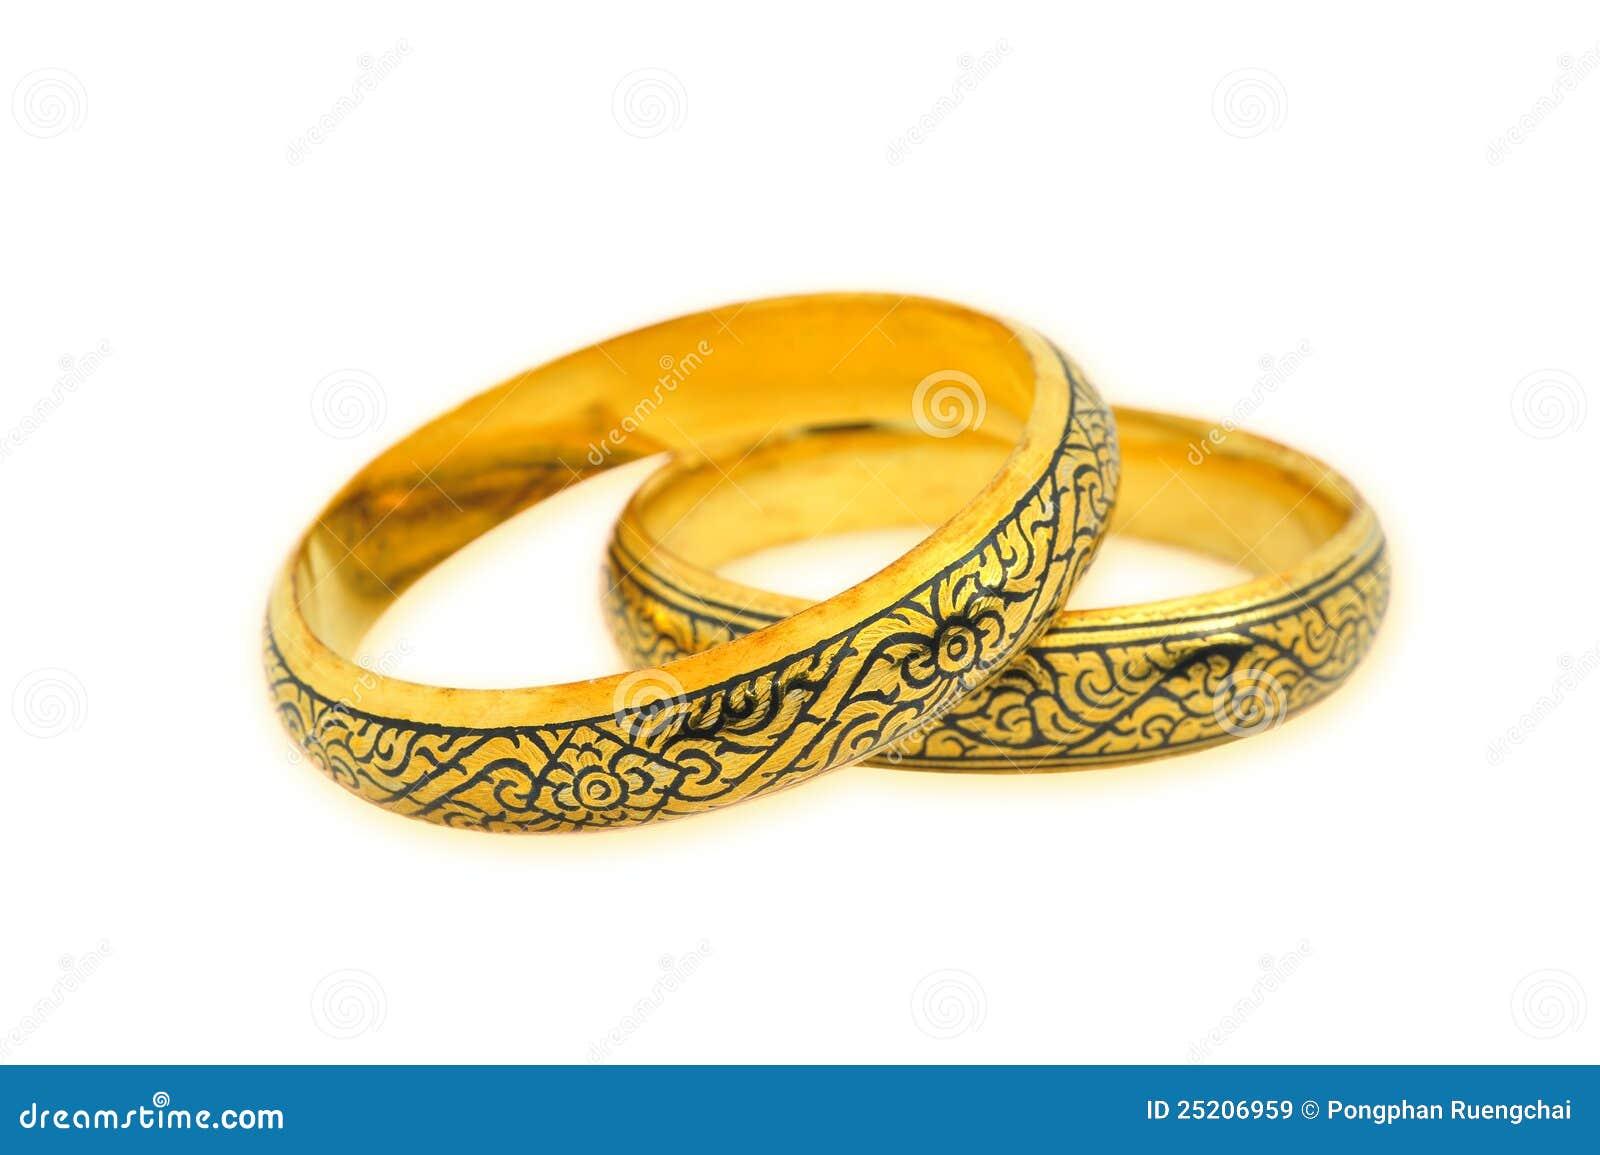 Download Golden bracelet stock image. Image of bracelet, isolated - 25206959